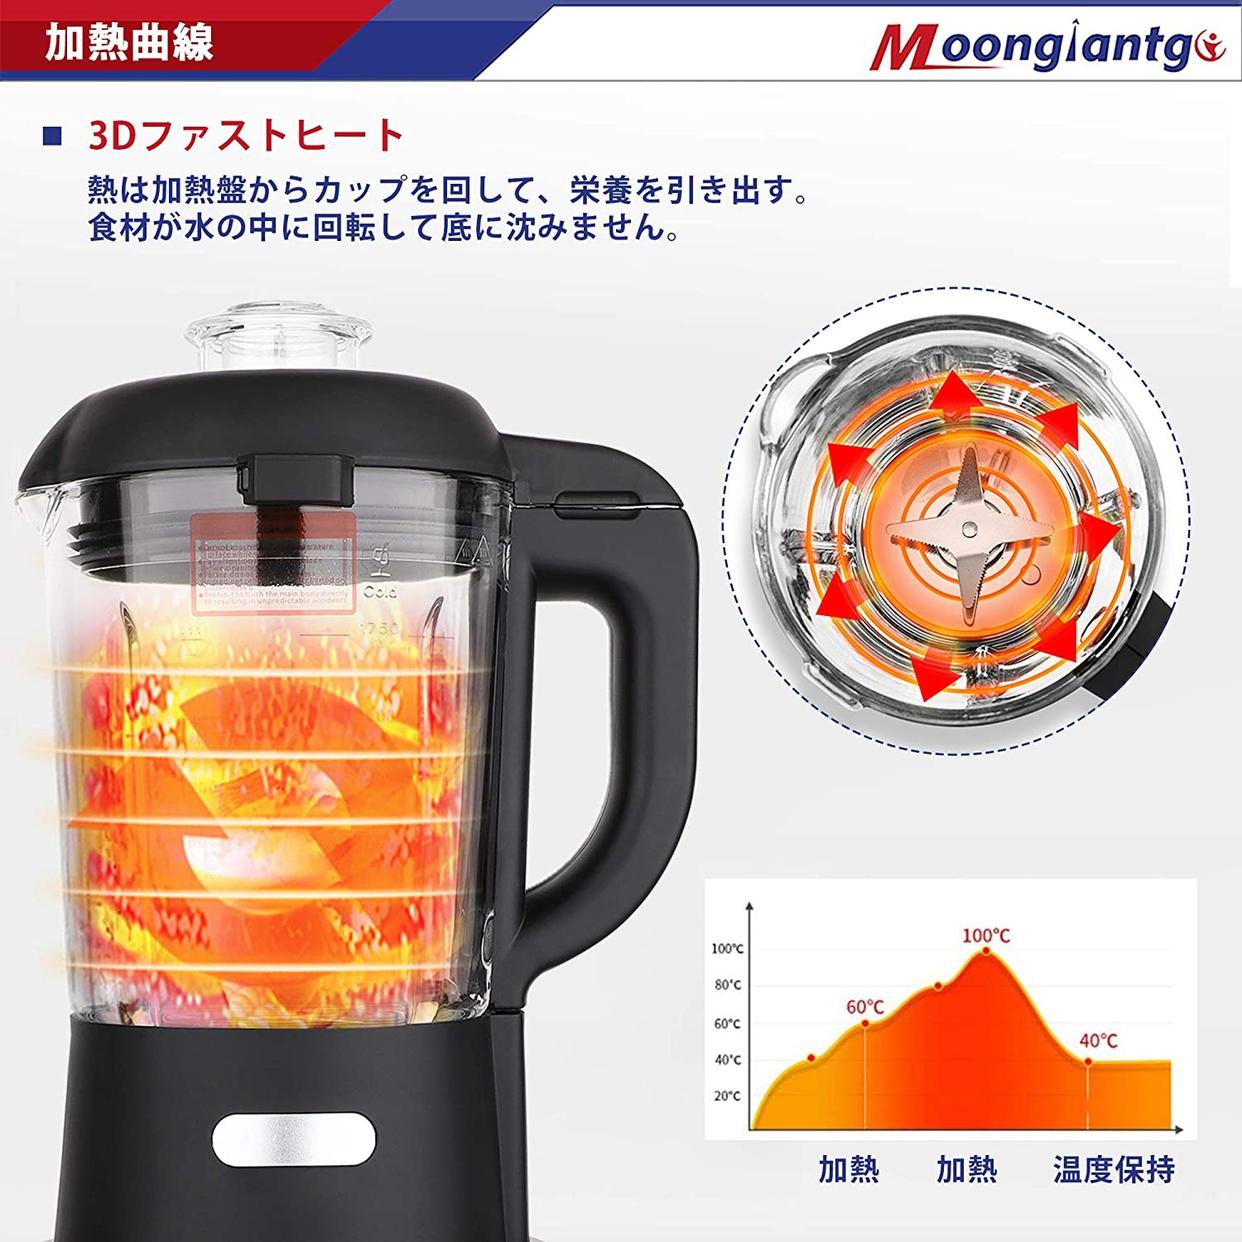 Moongiantgo(ムーンジャイアントゴー) 豆乳機 多機能調理器の商品画像3